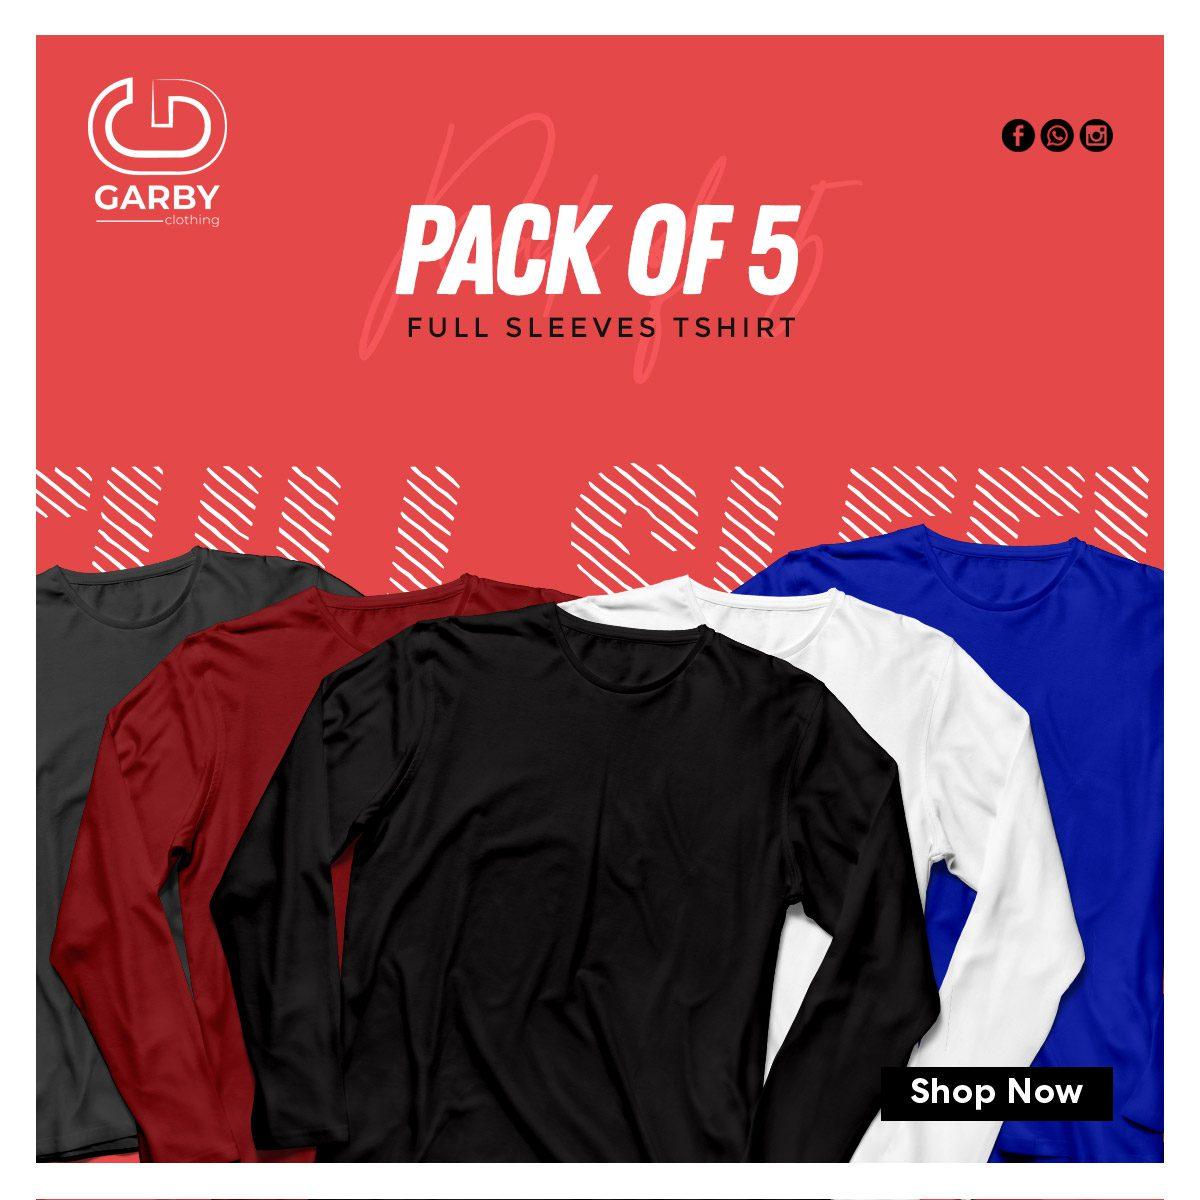 Pack-of-the-5-full-sleeves